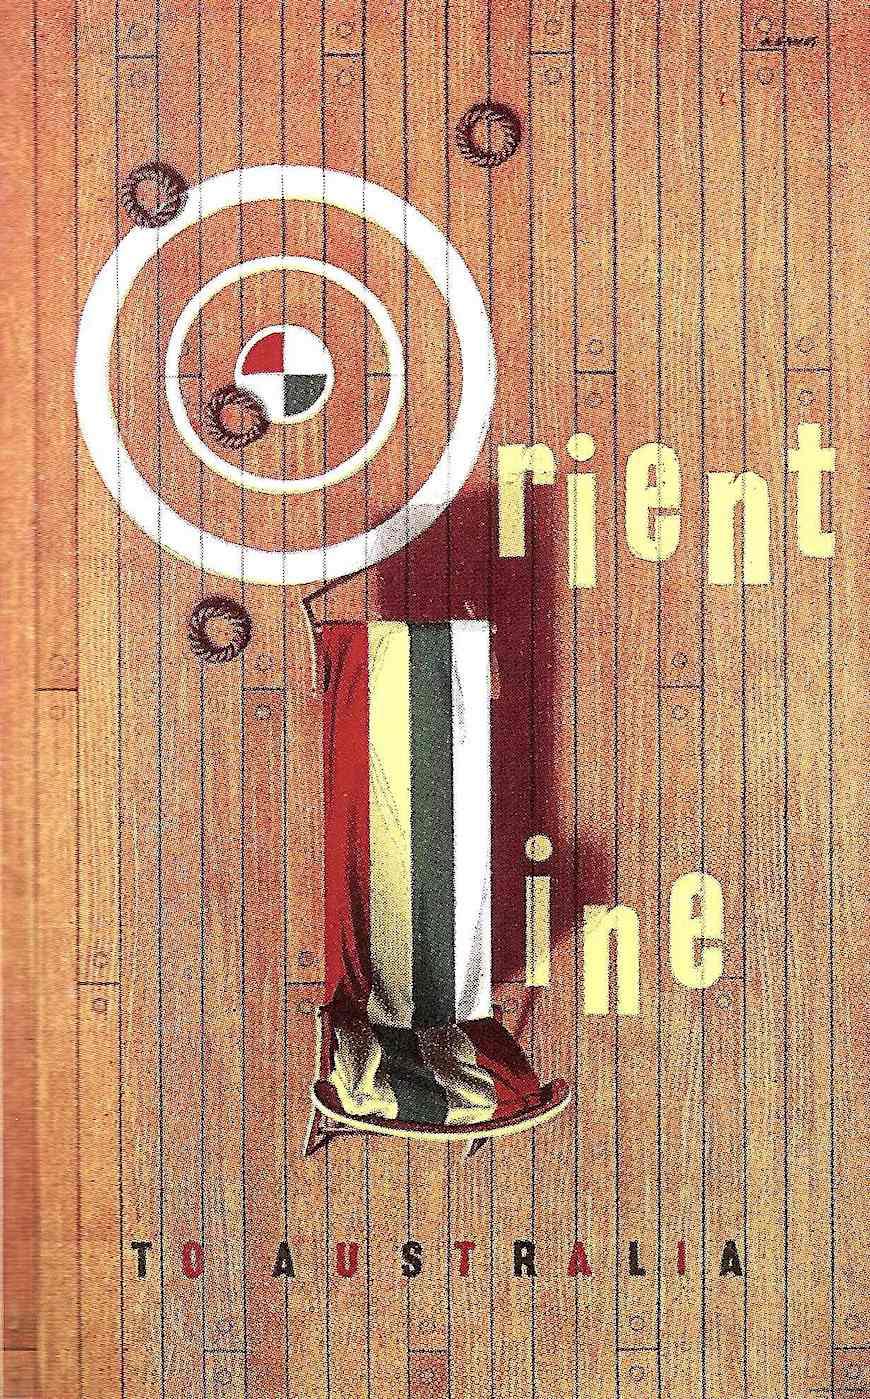 an Abram Games poster illustration, 1954 Orient line to Australia, a deck chair